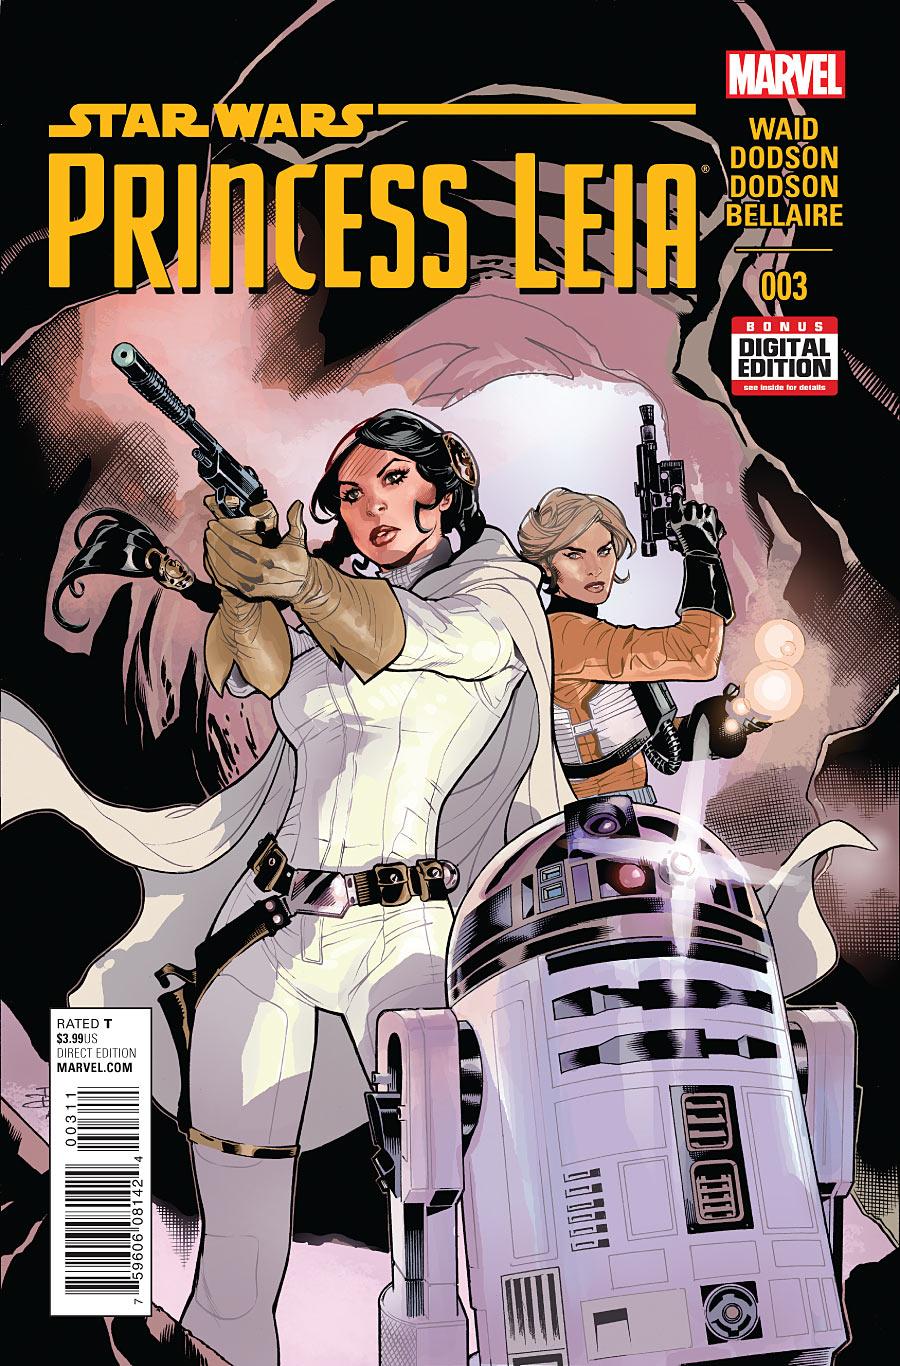 Star Wars: Princess Leia #3